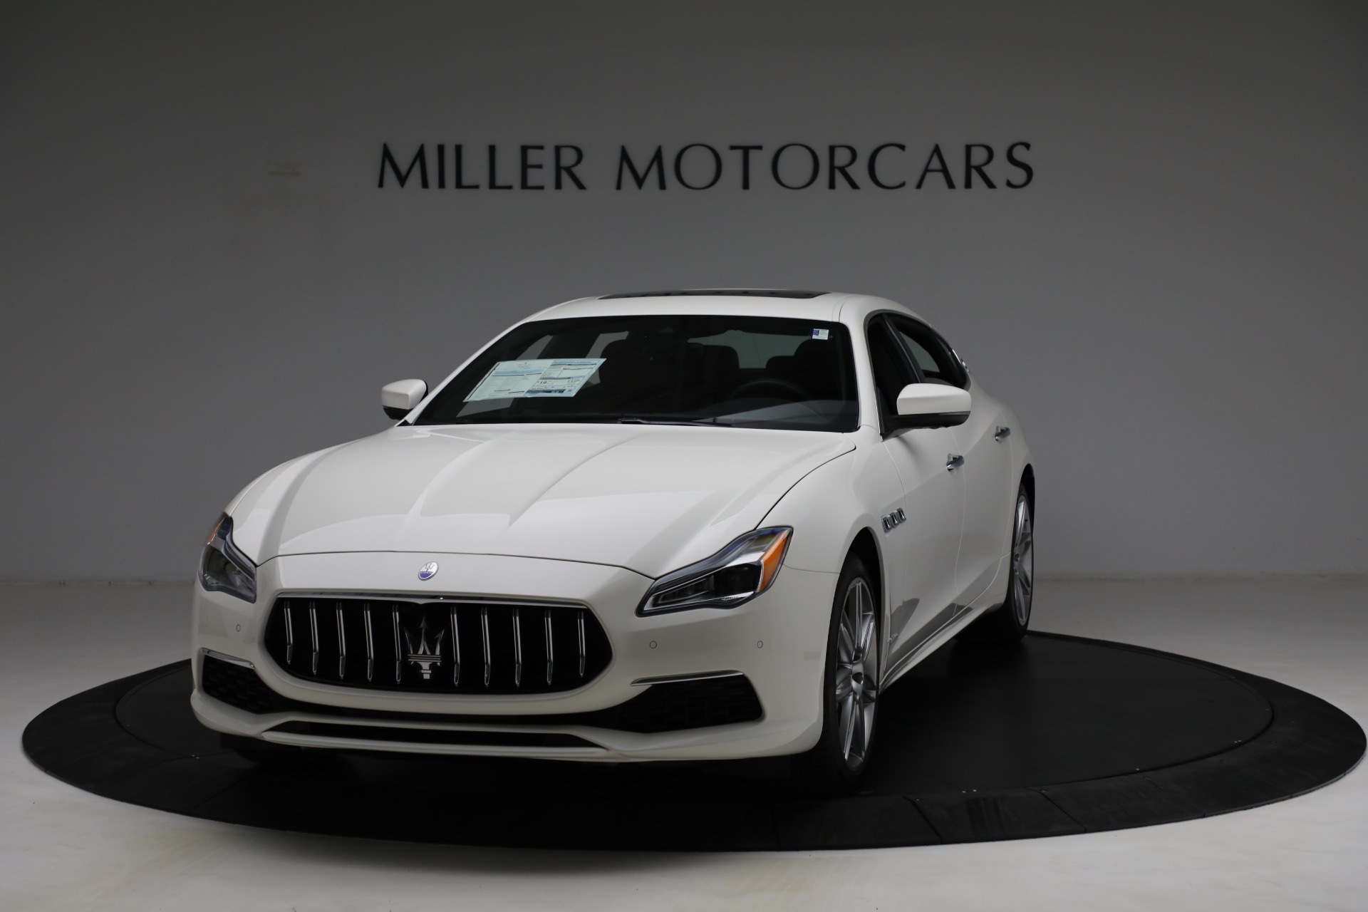 New 2021 Maserati Quattroporte S Q4 GranLusso for sale $120,599 at Bentley Greenwich in Greenwich CT 06830 1